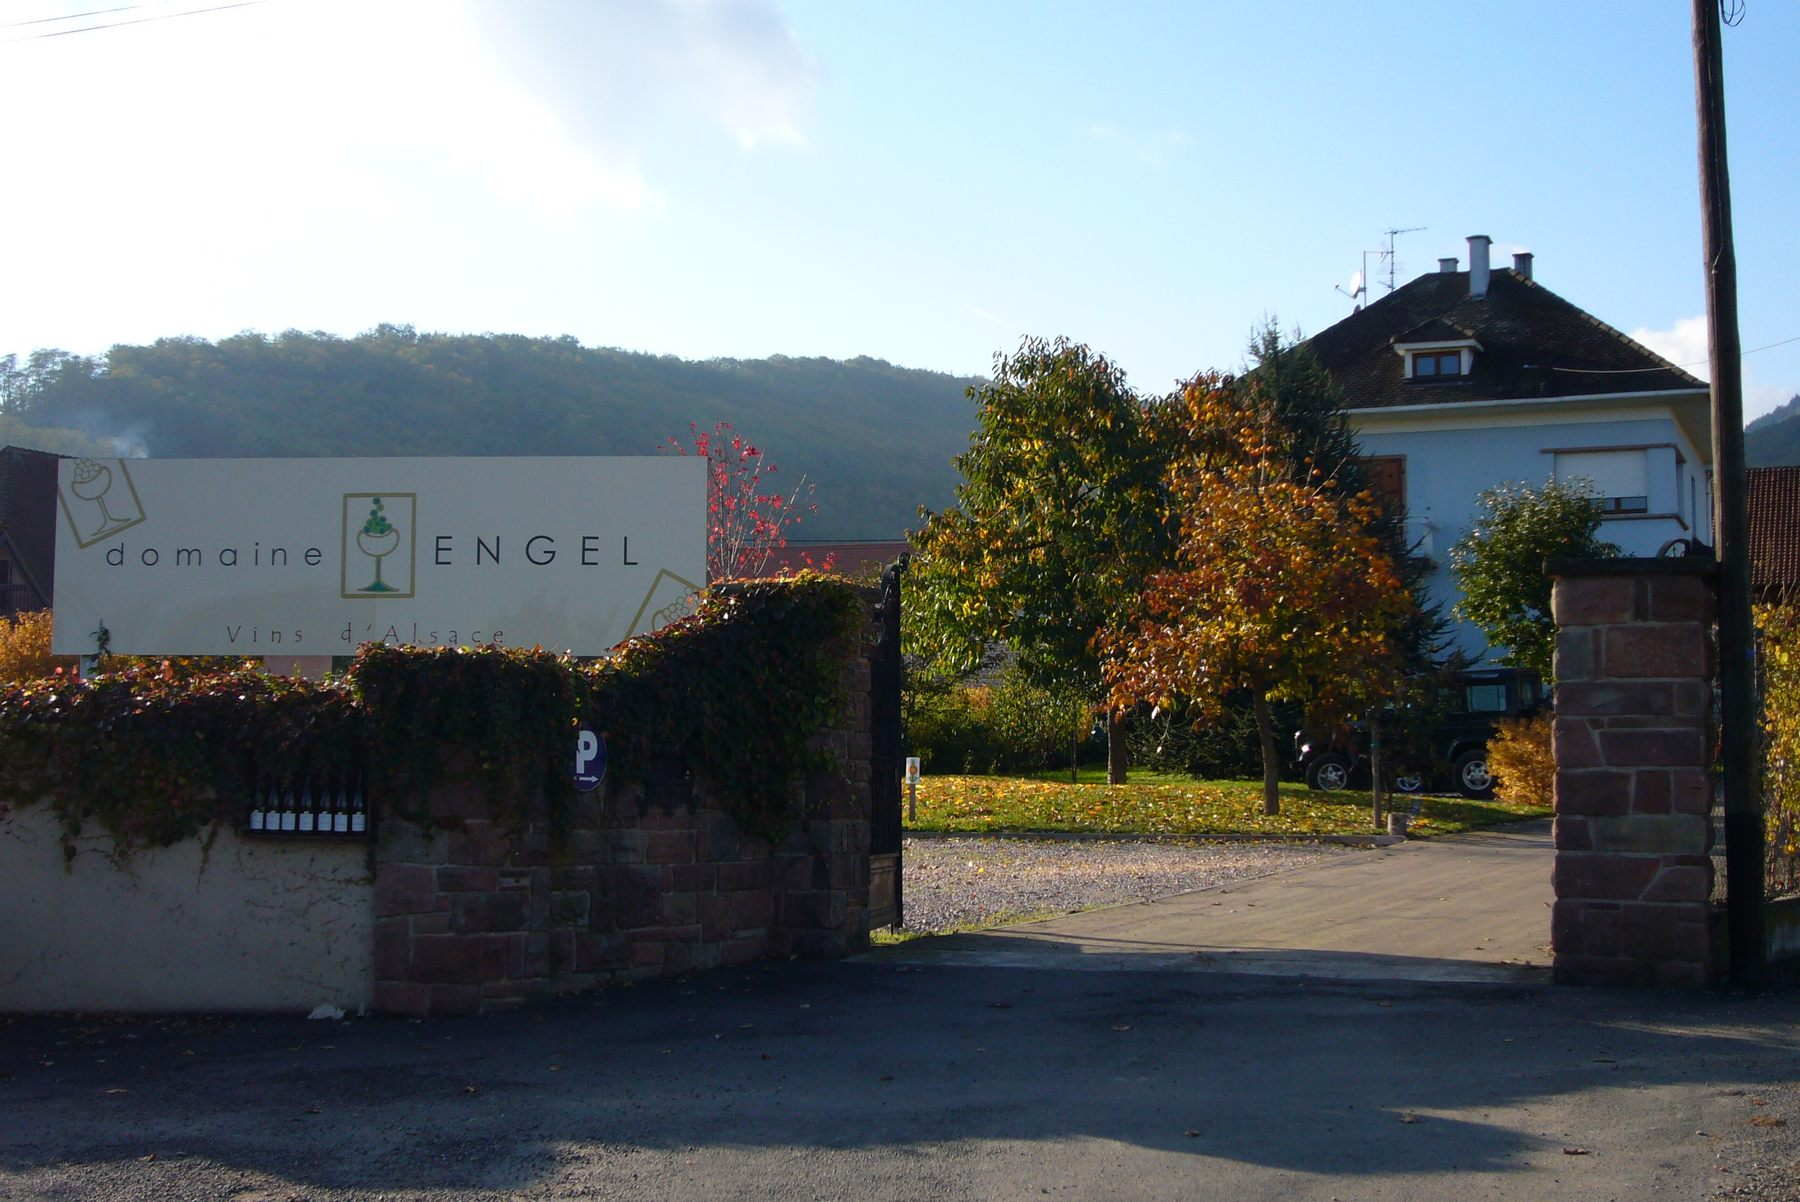 Domaine Engel Frères